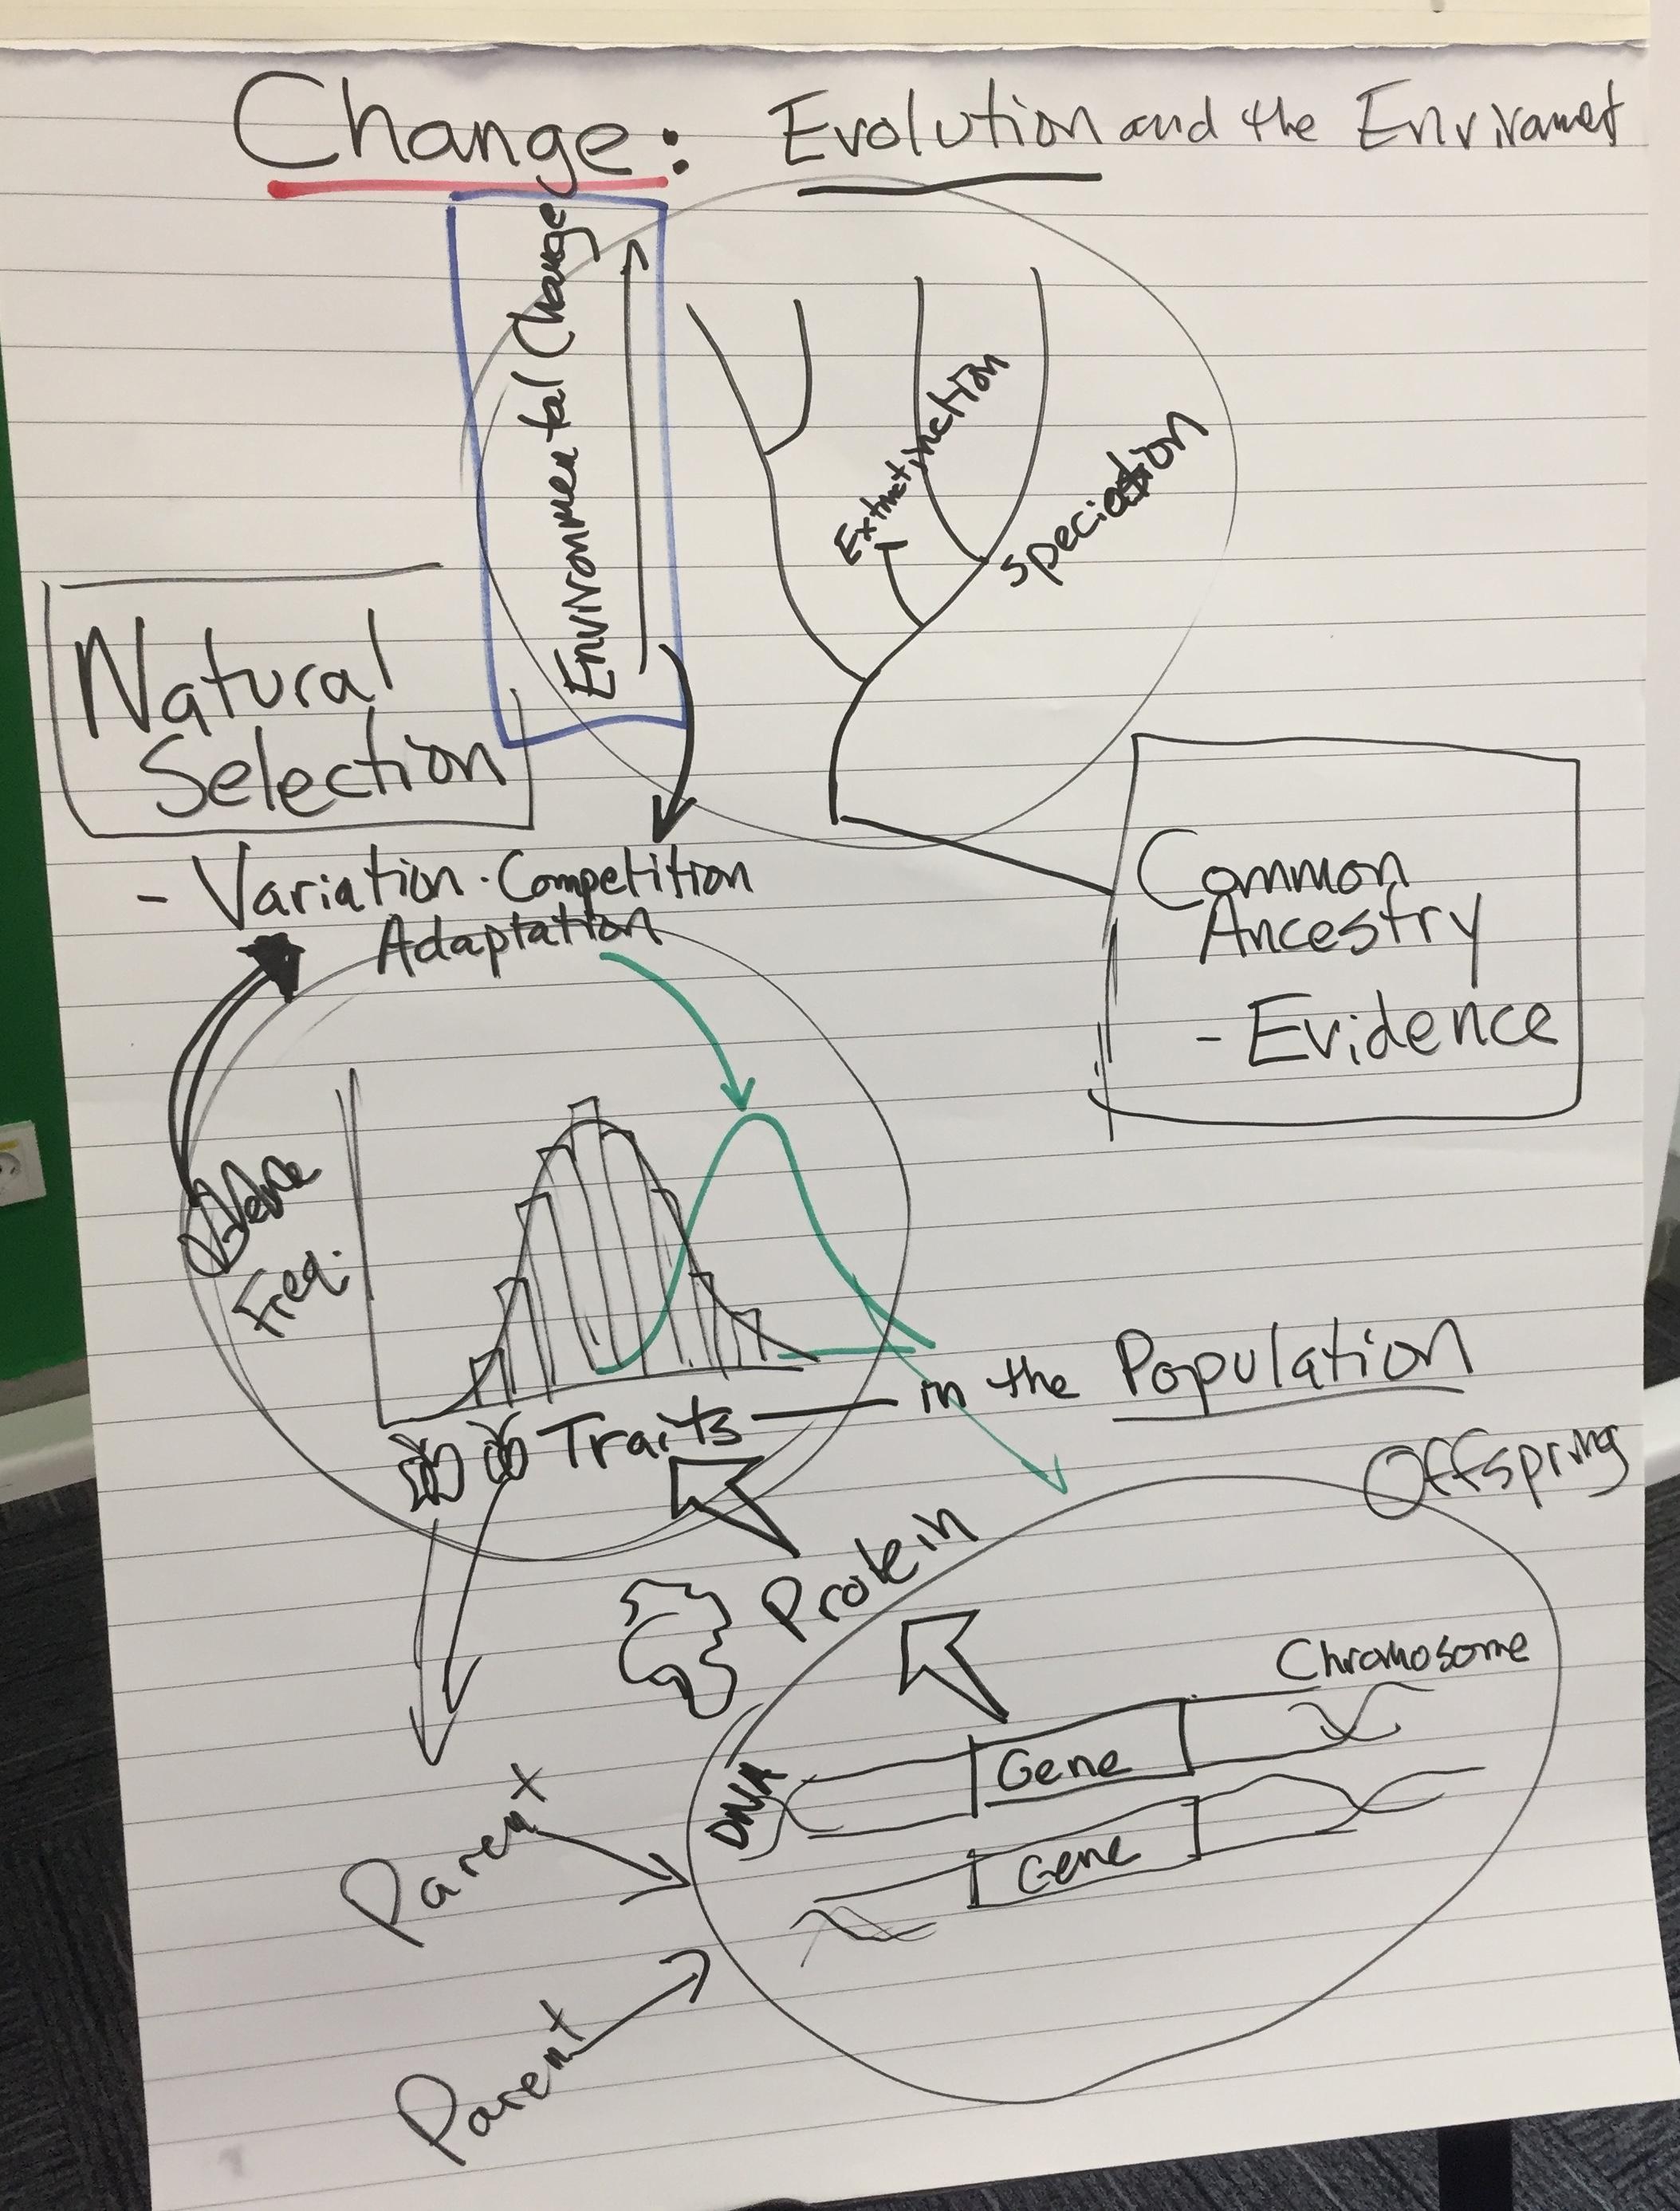 HS Natural Selection and Evolution.JPG